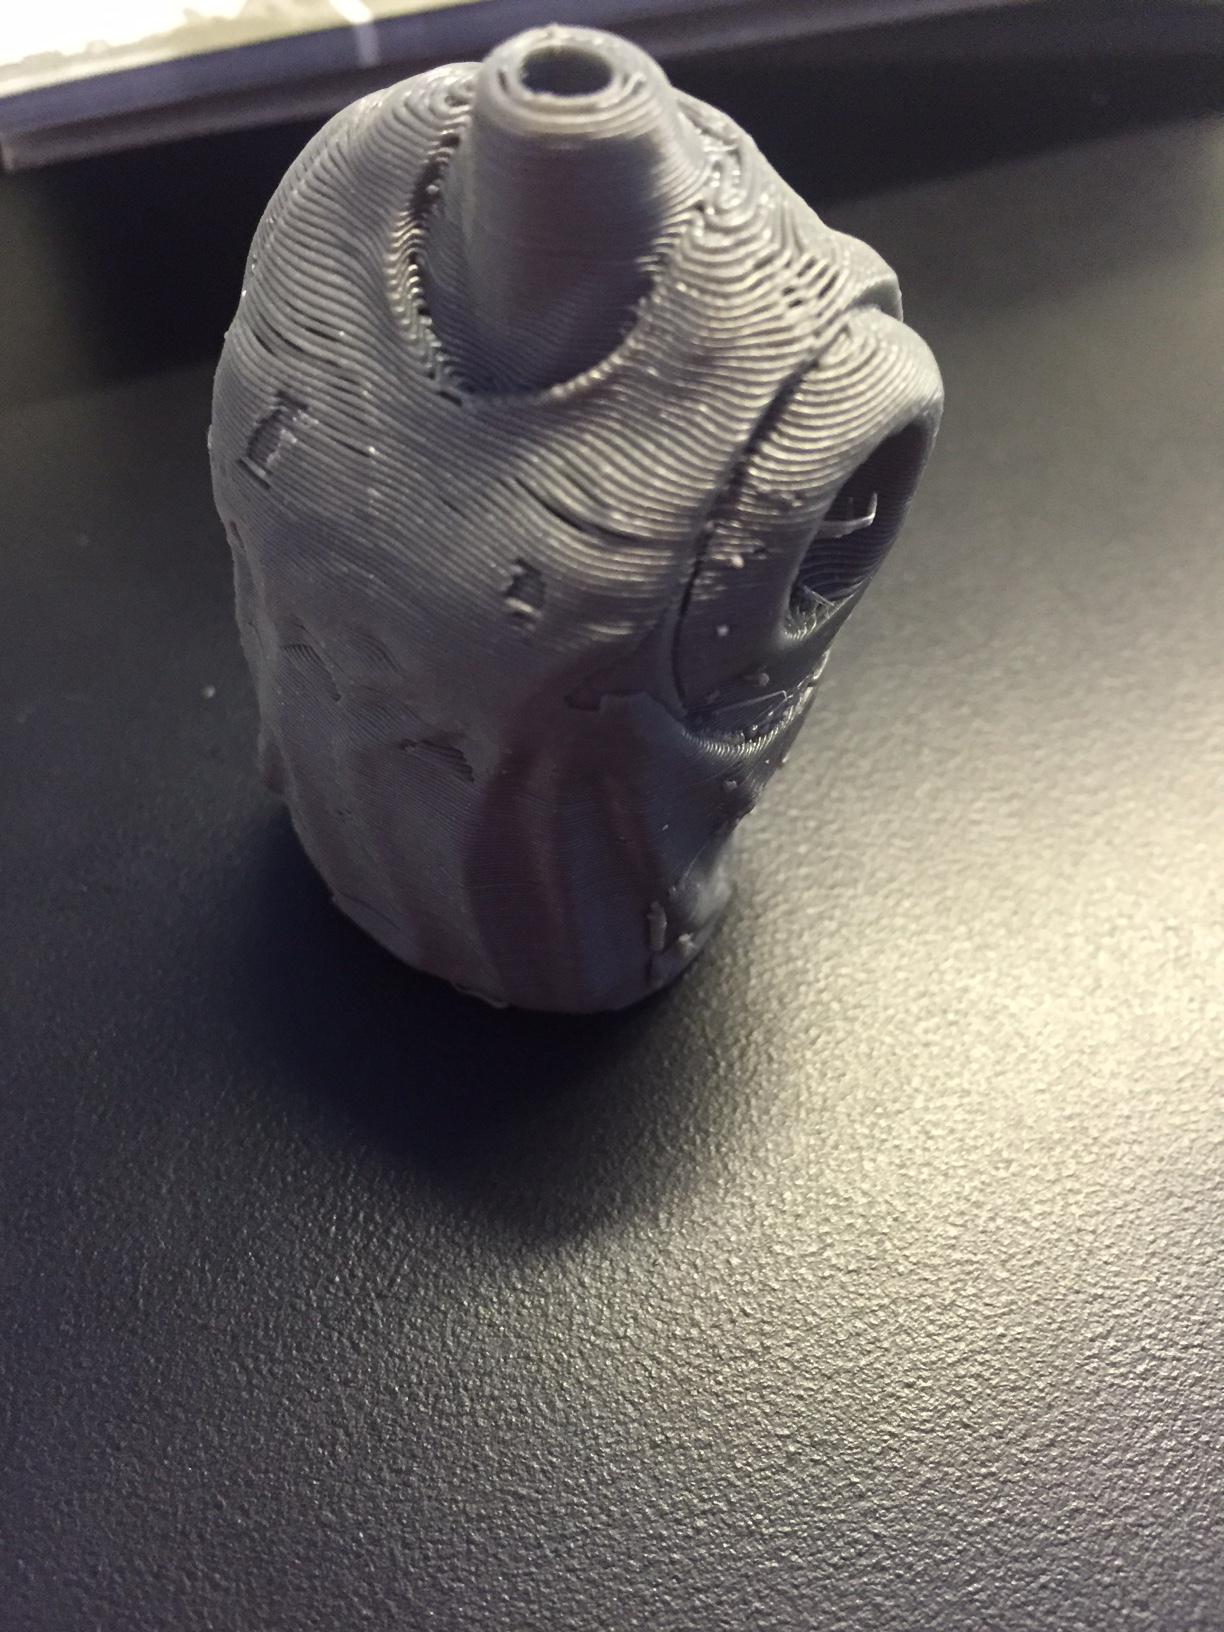 FlashForge Creator Pro - Bad Print Quality - 3D Printing / 3D